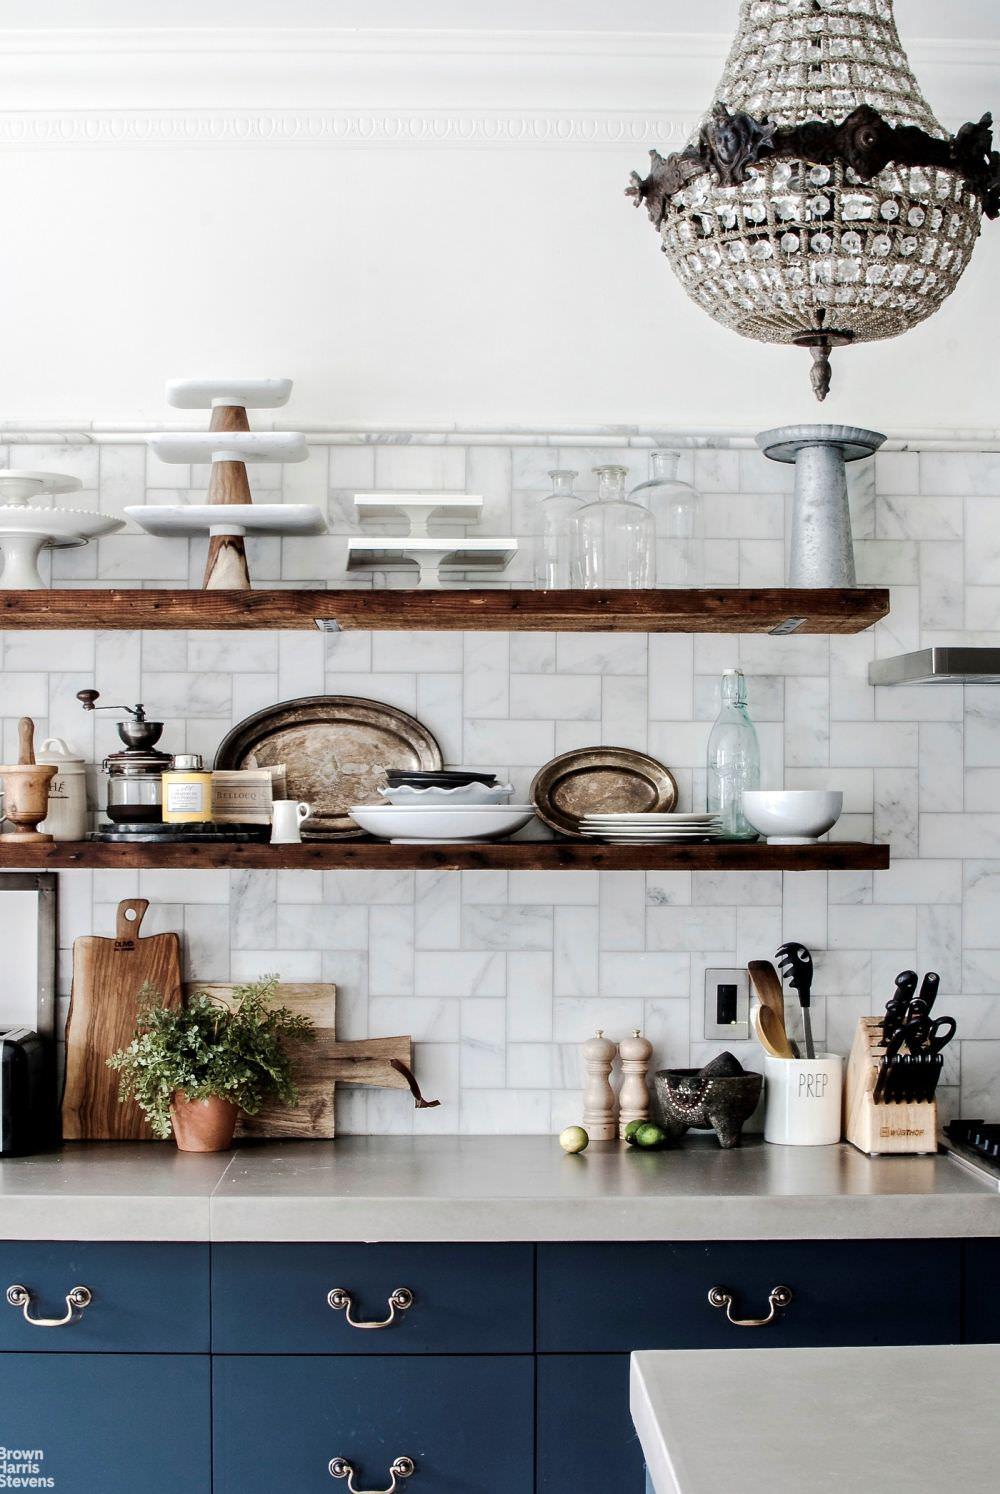 mutfak-acik-raf-modelleri